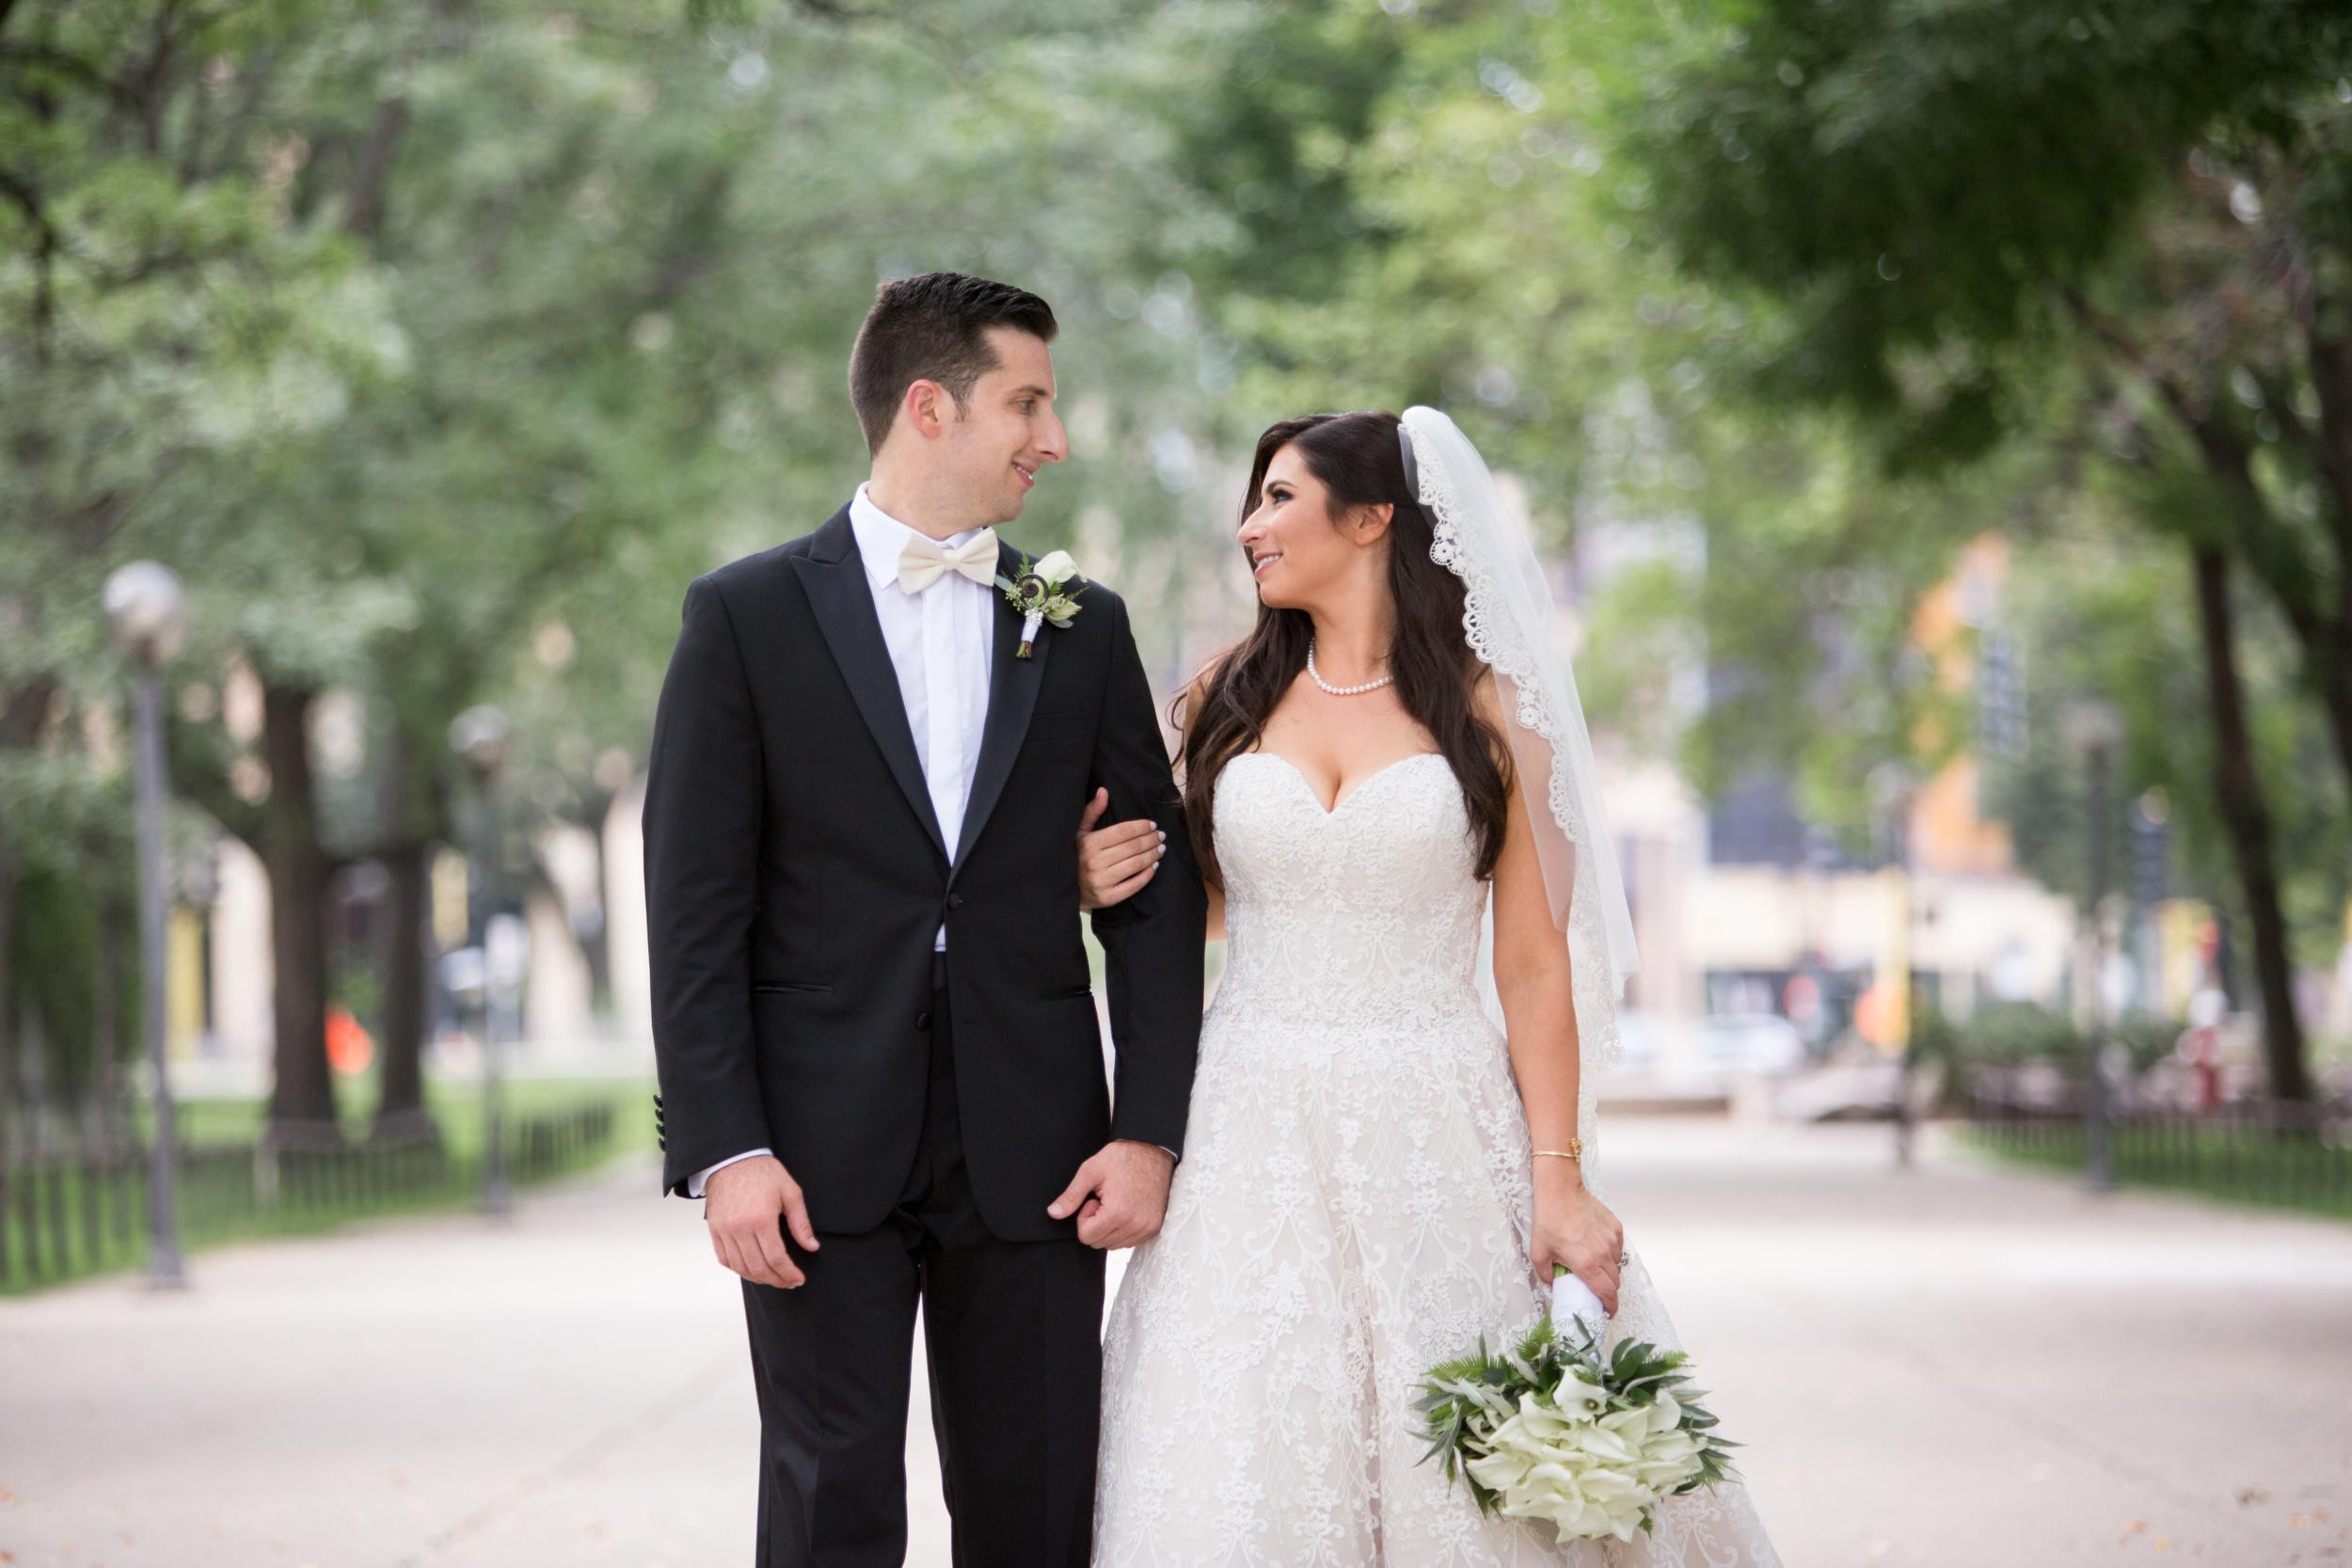 Acowsay_Cinema_MN_Wedding_Couple_2.jpg